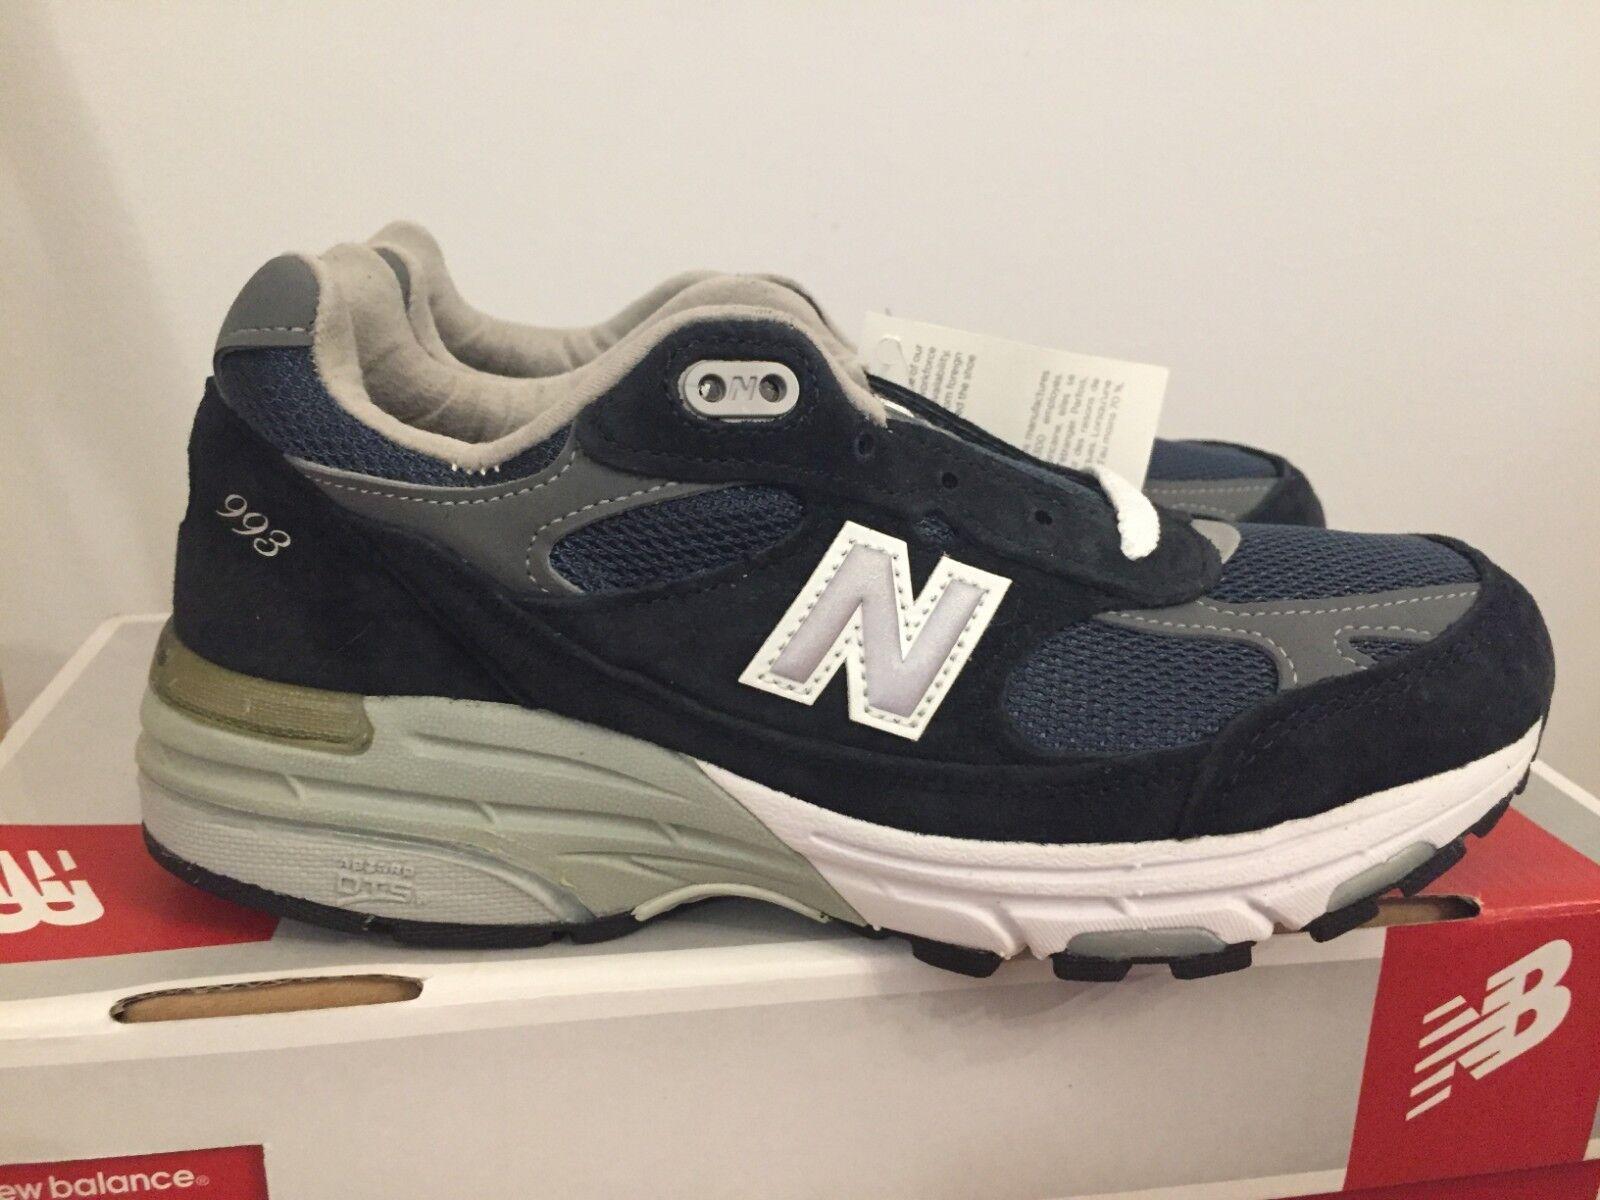 New New New Balance Women's Classics 993 Running shoes -Navy 536479